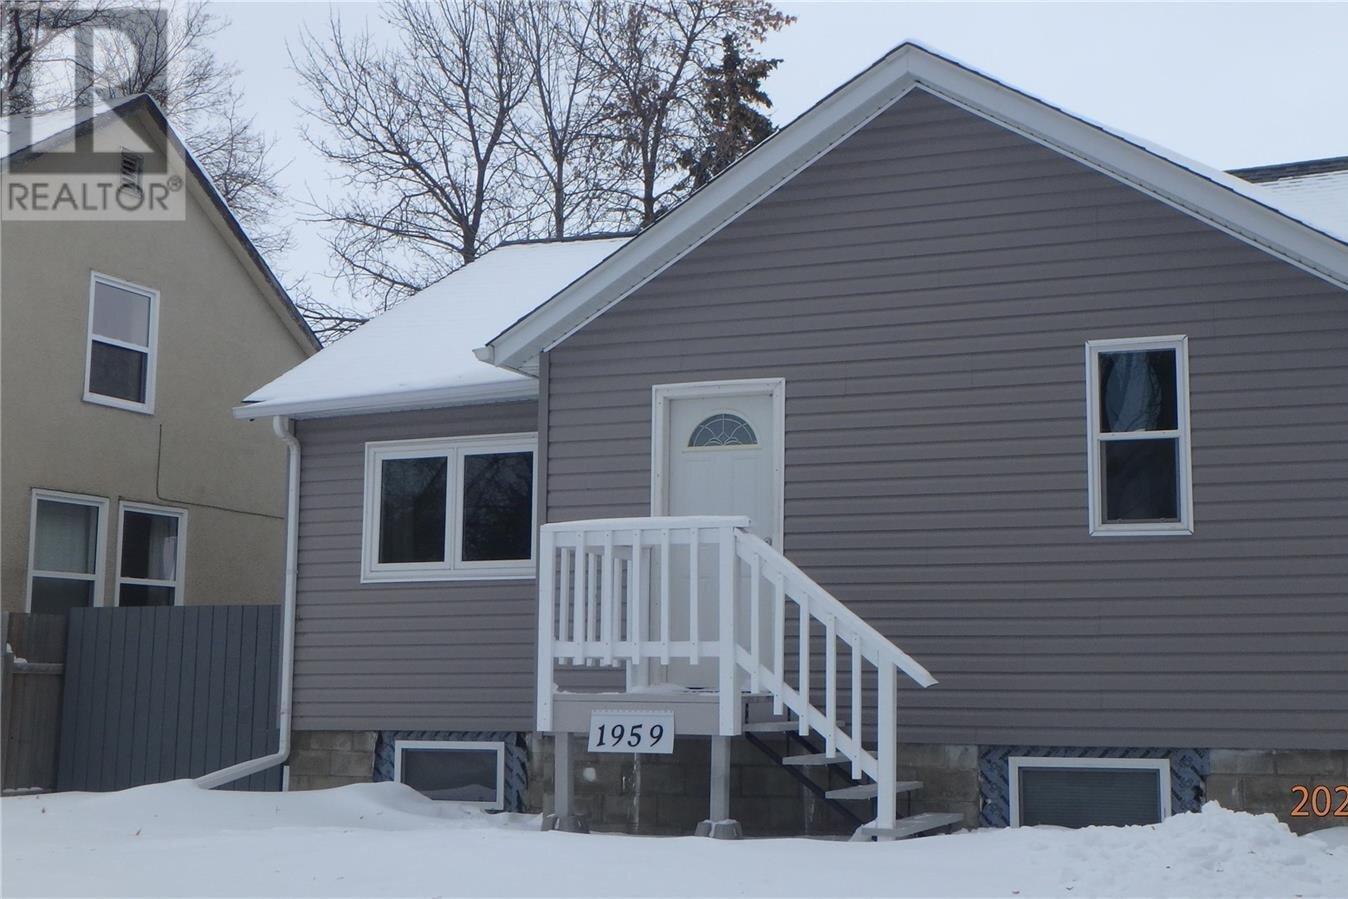 House for sale at 1959 15th St W Prince Albert Saskatchewan - MLS: SK834045